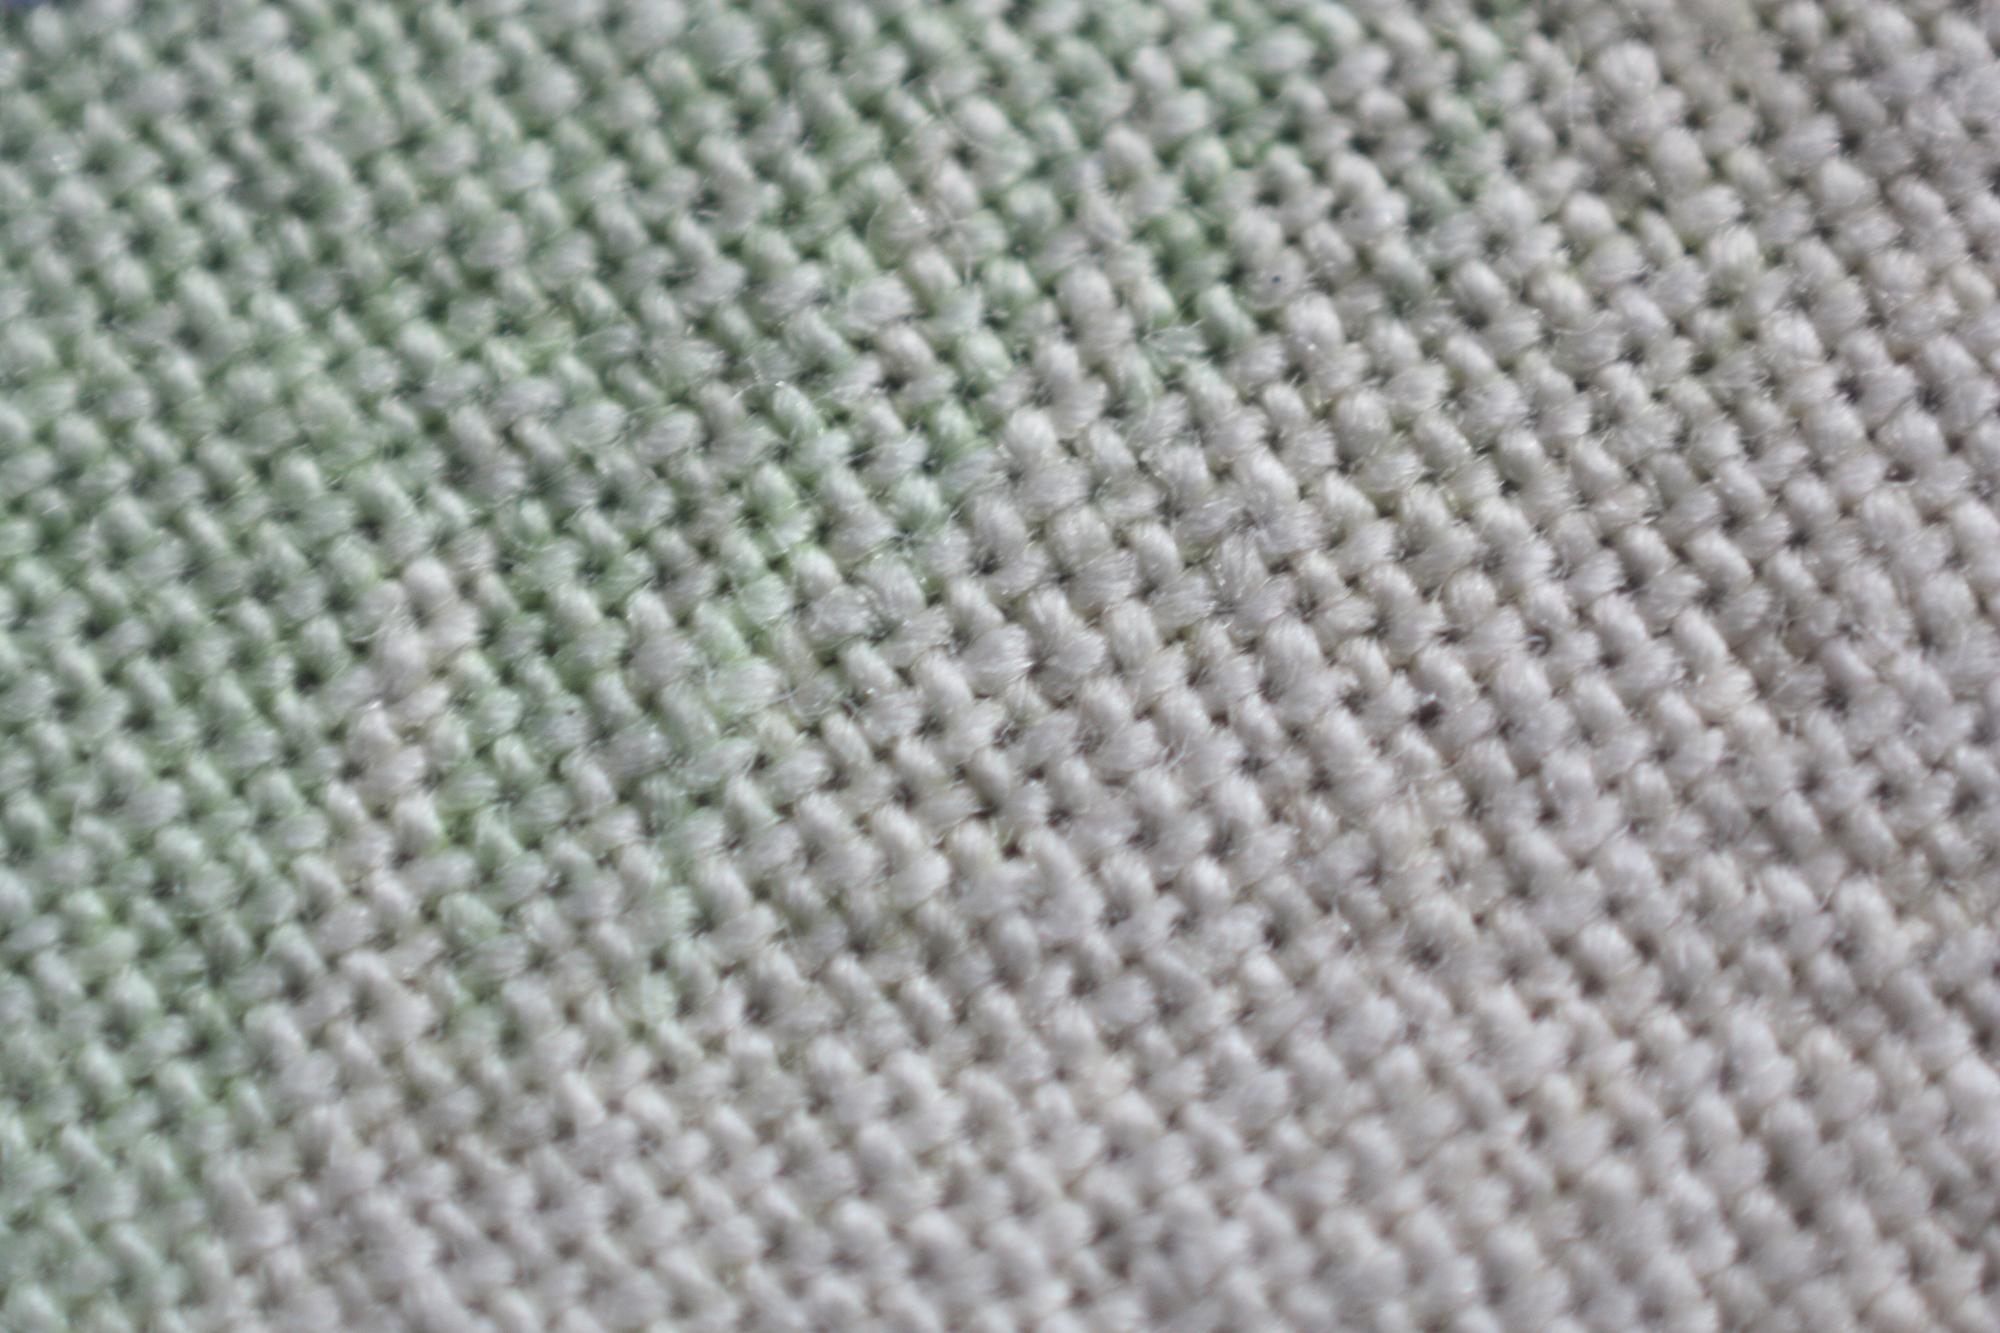 purified cotton blends